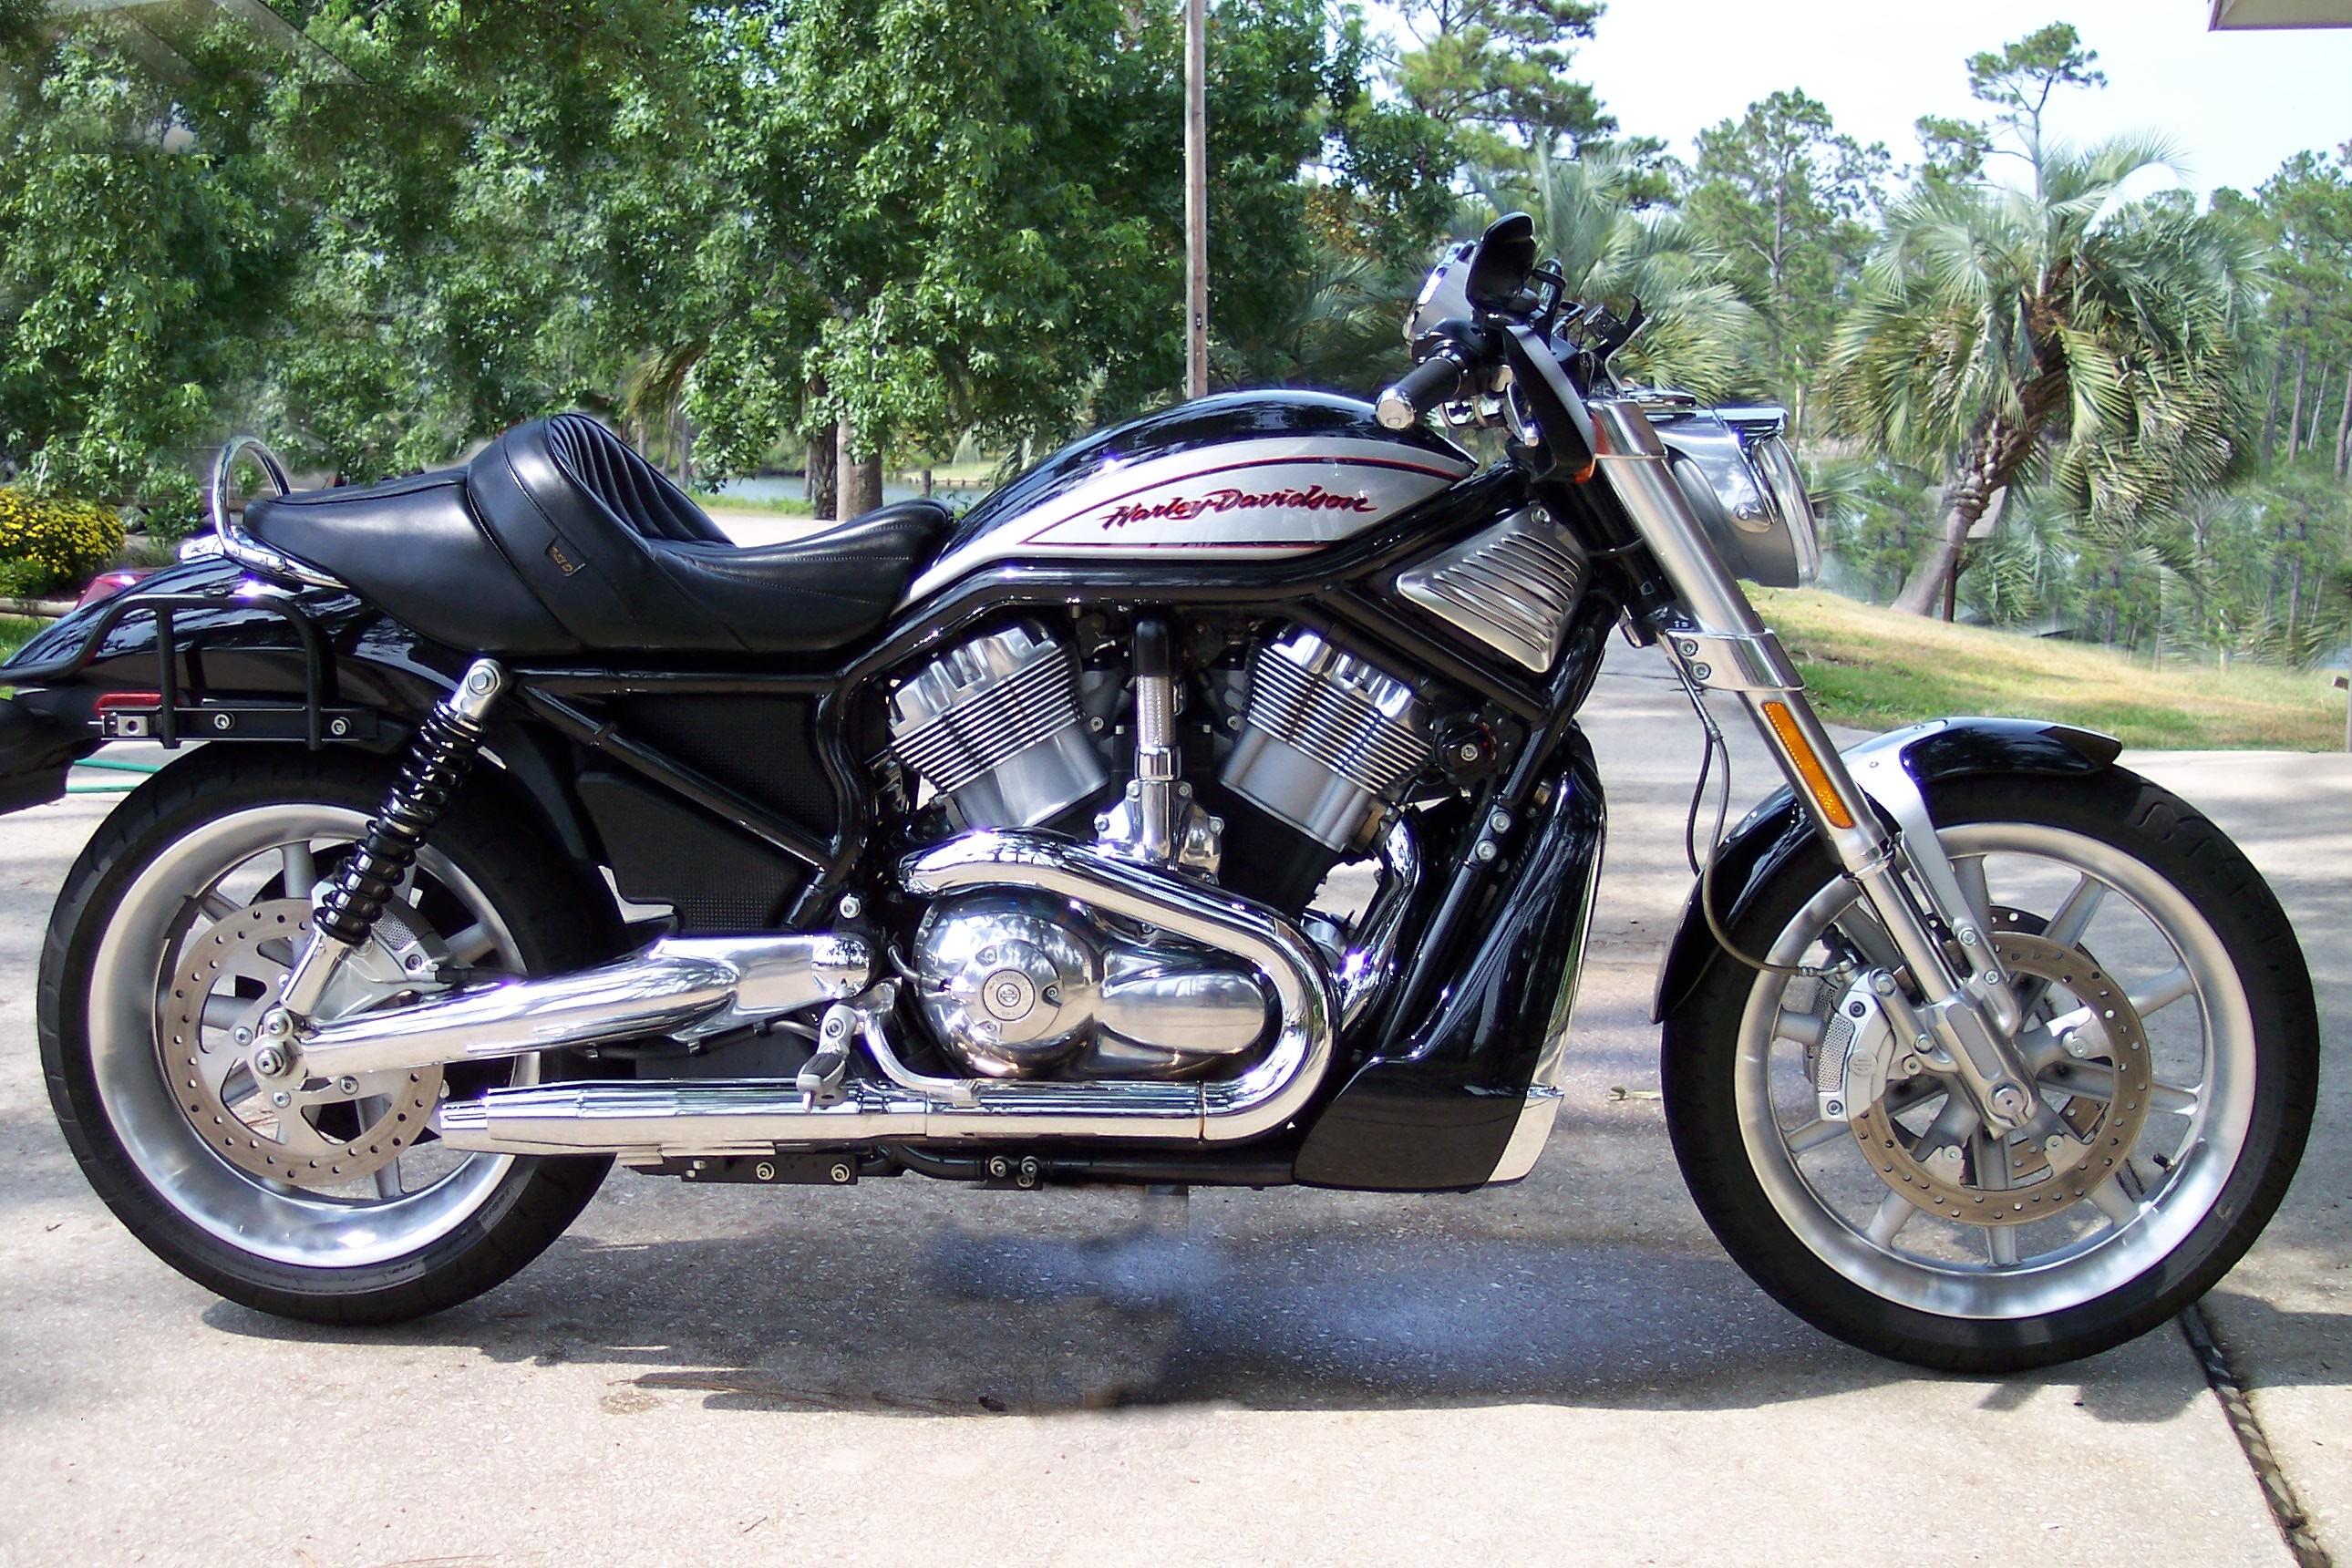 New Harley Davidson V Rod Owner Any Others Adventure Rider